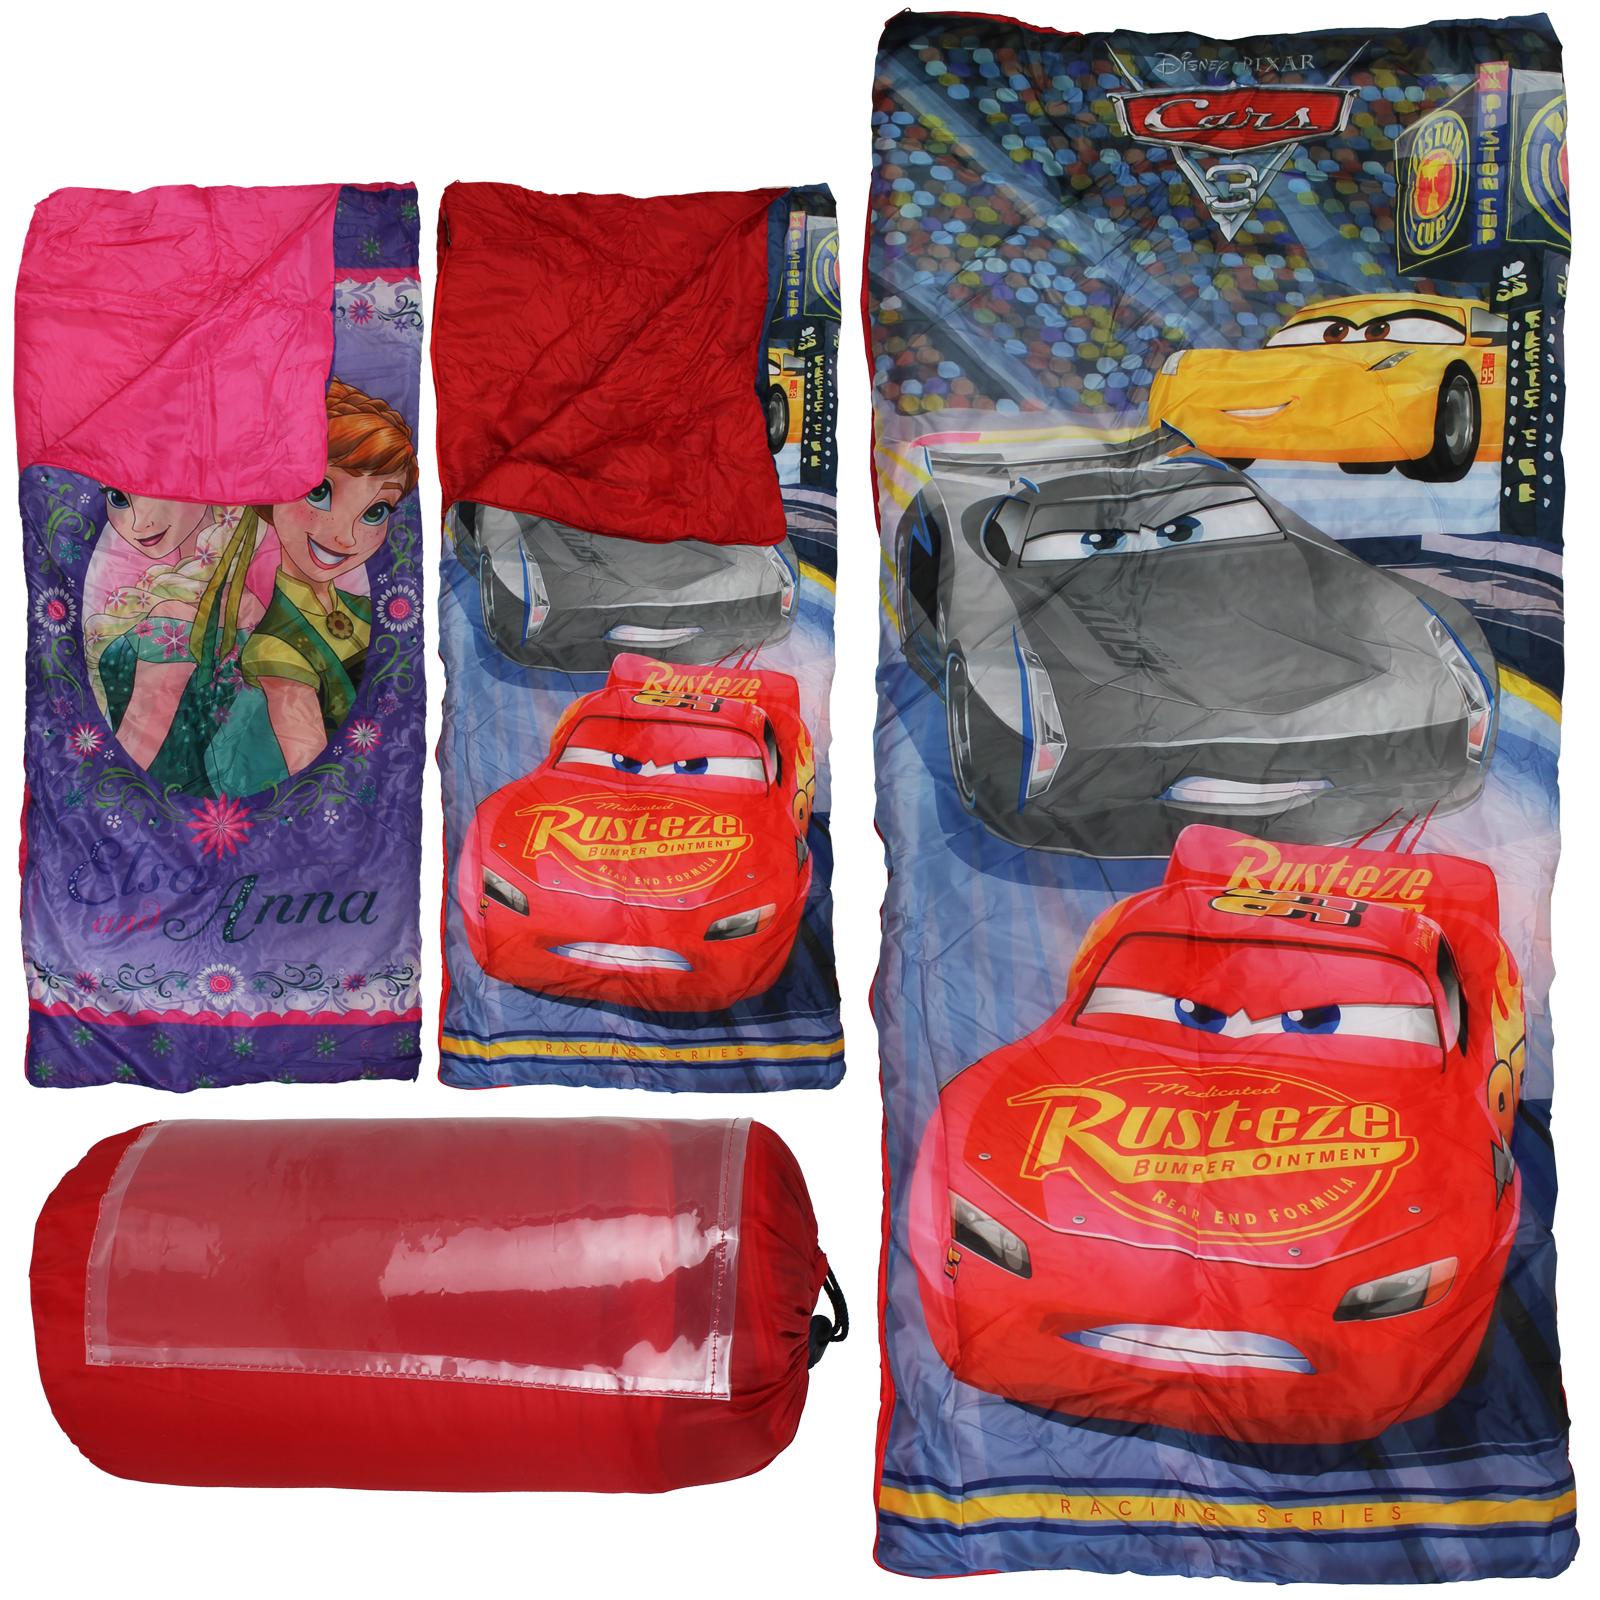 Disney-Kinder-Schlafsack-Decke-Bettwaesche-Zelt-Camping-Outdoor-Kinderdecke-150cm